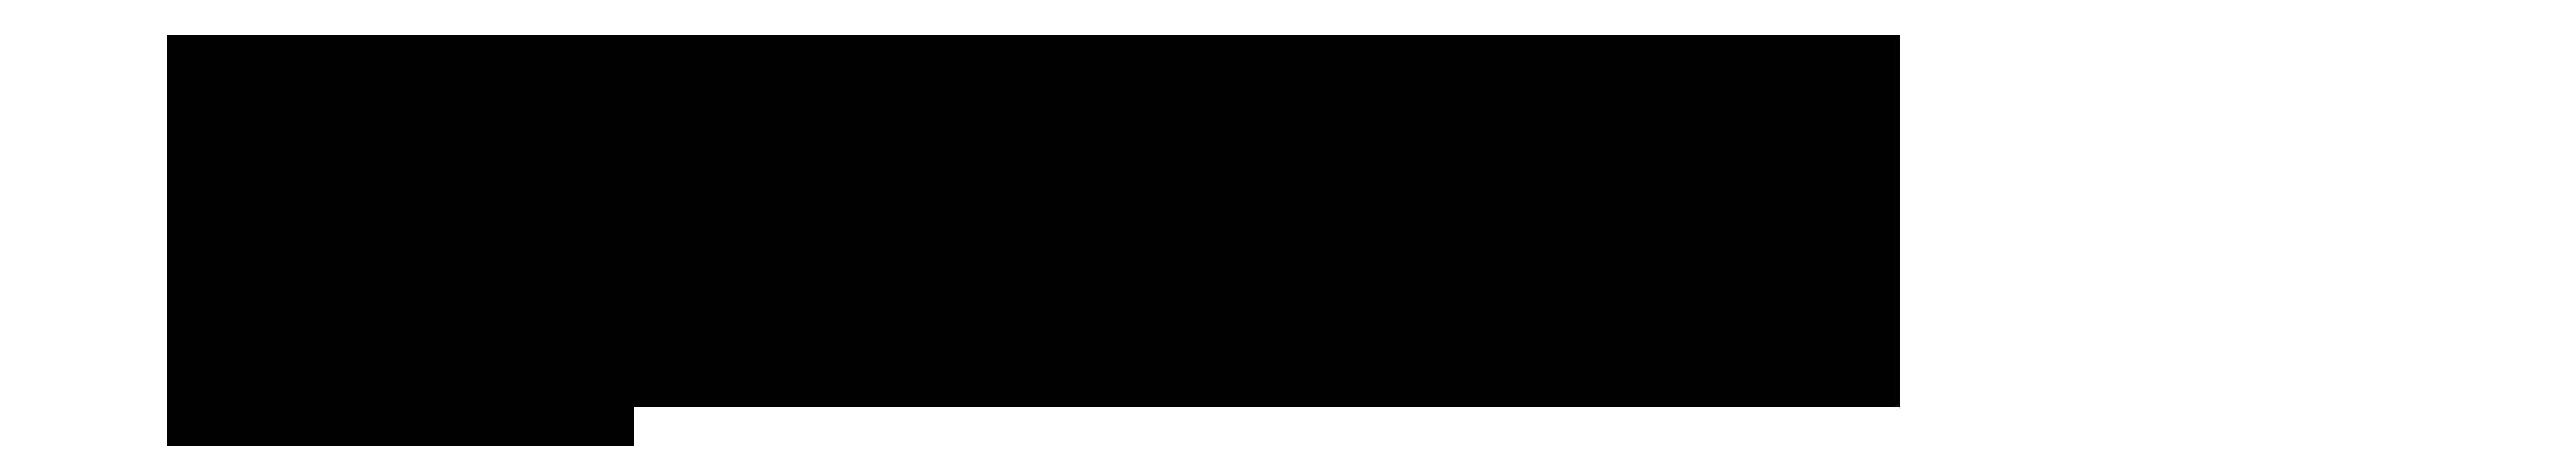 Typeface-Heimat-Stencil-F02-Atlas-Font-Foundry